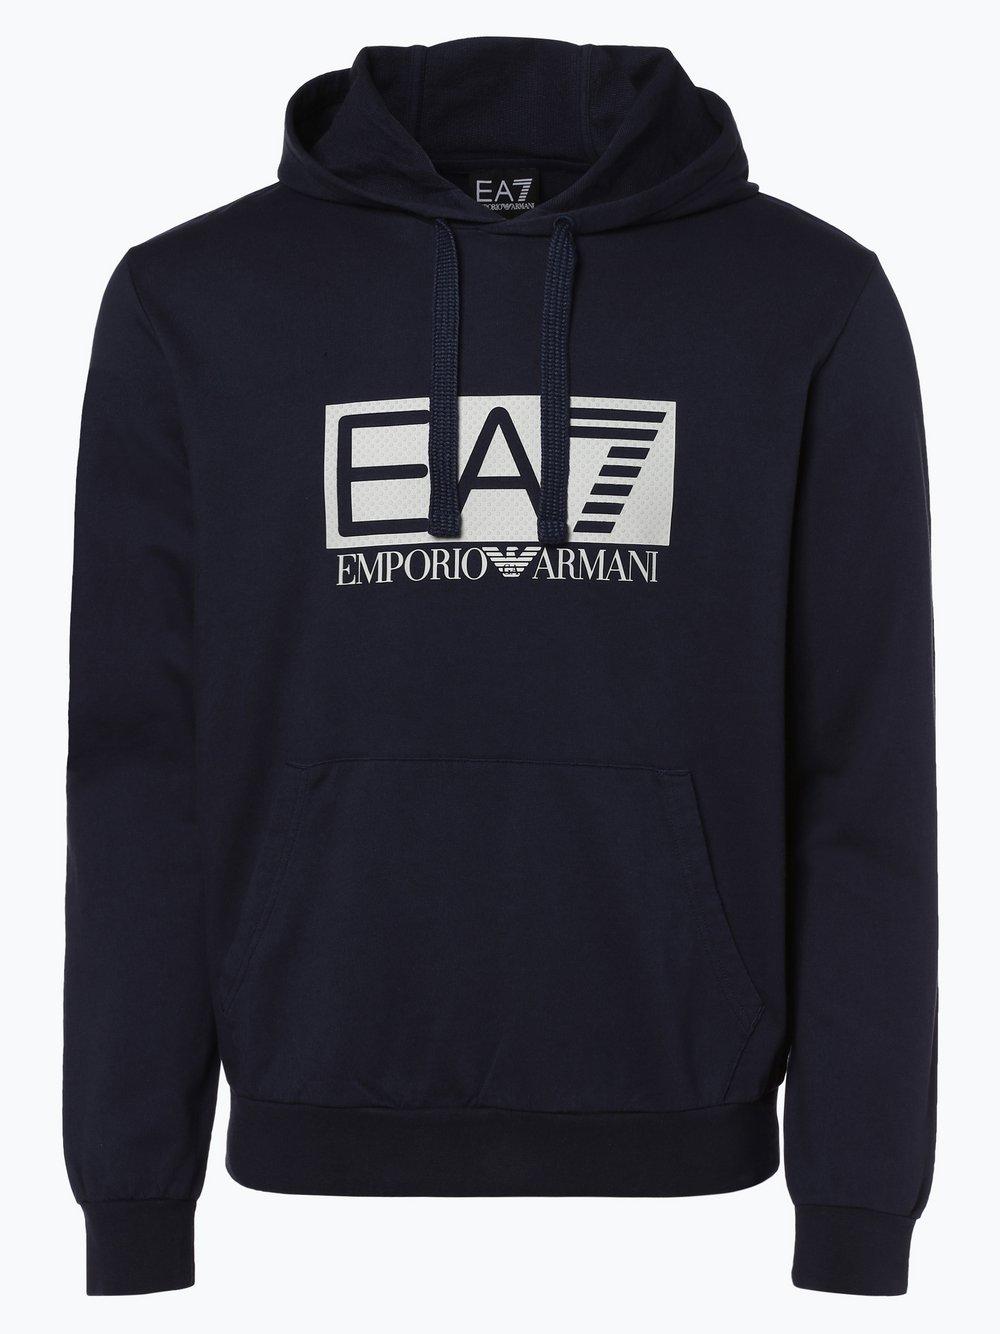 aa91955ed827 EA7 Emporio Armani Męska bluza nierozpinana kup online